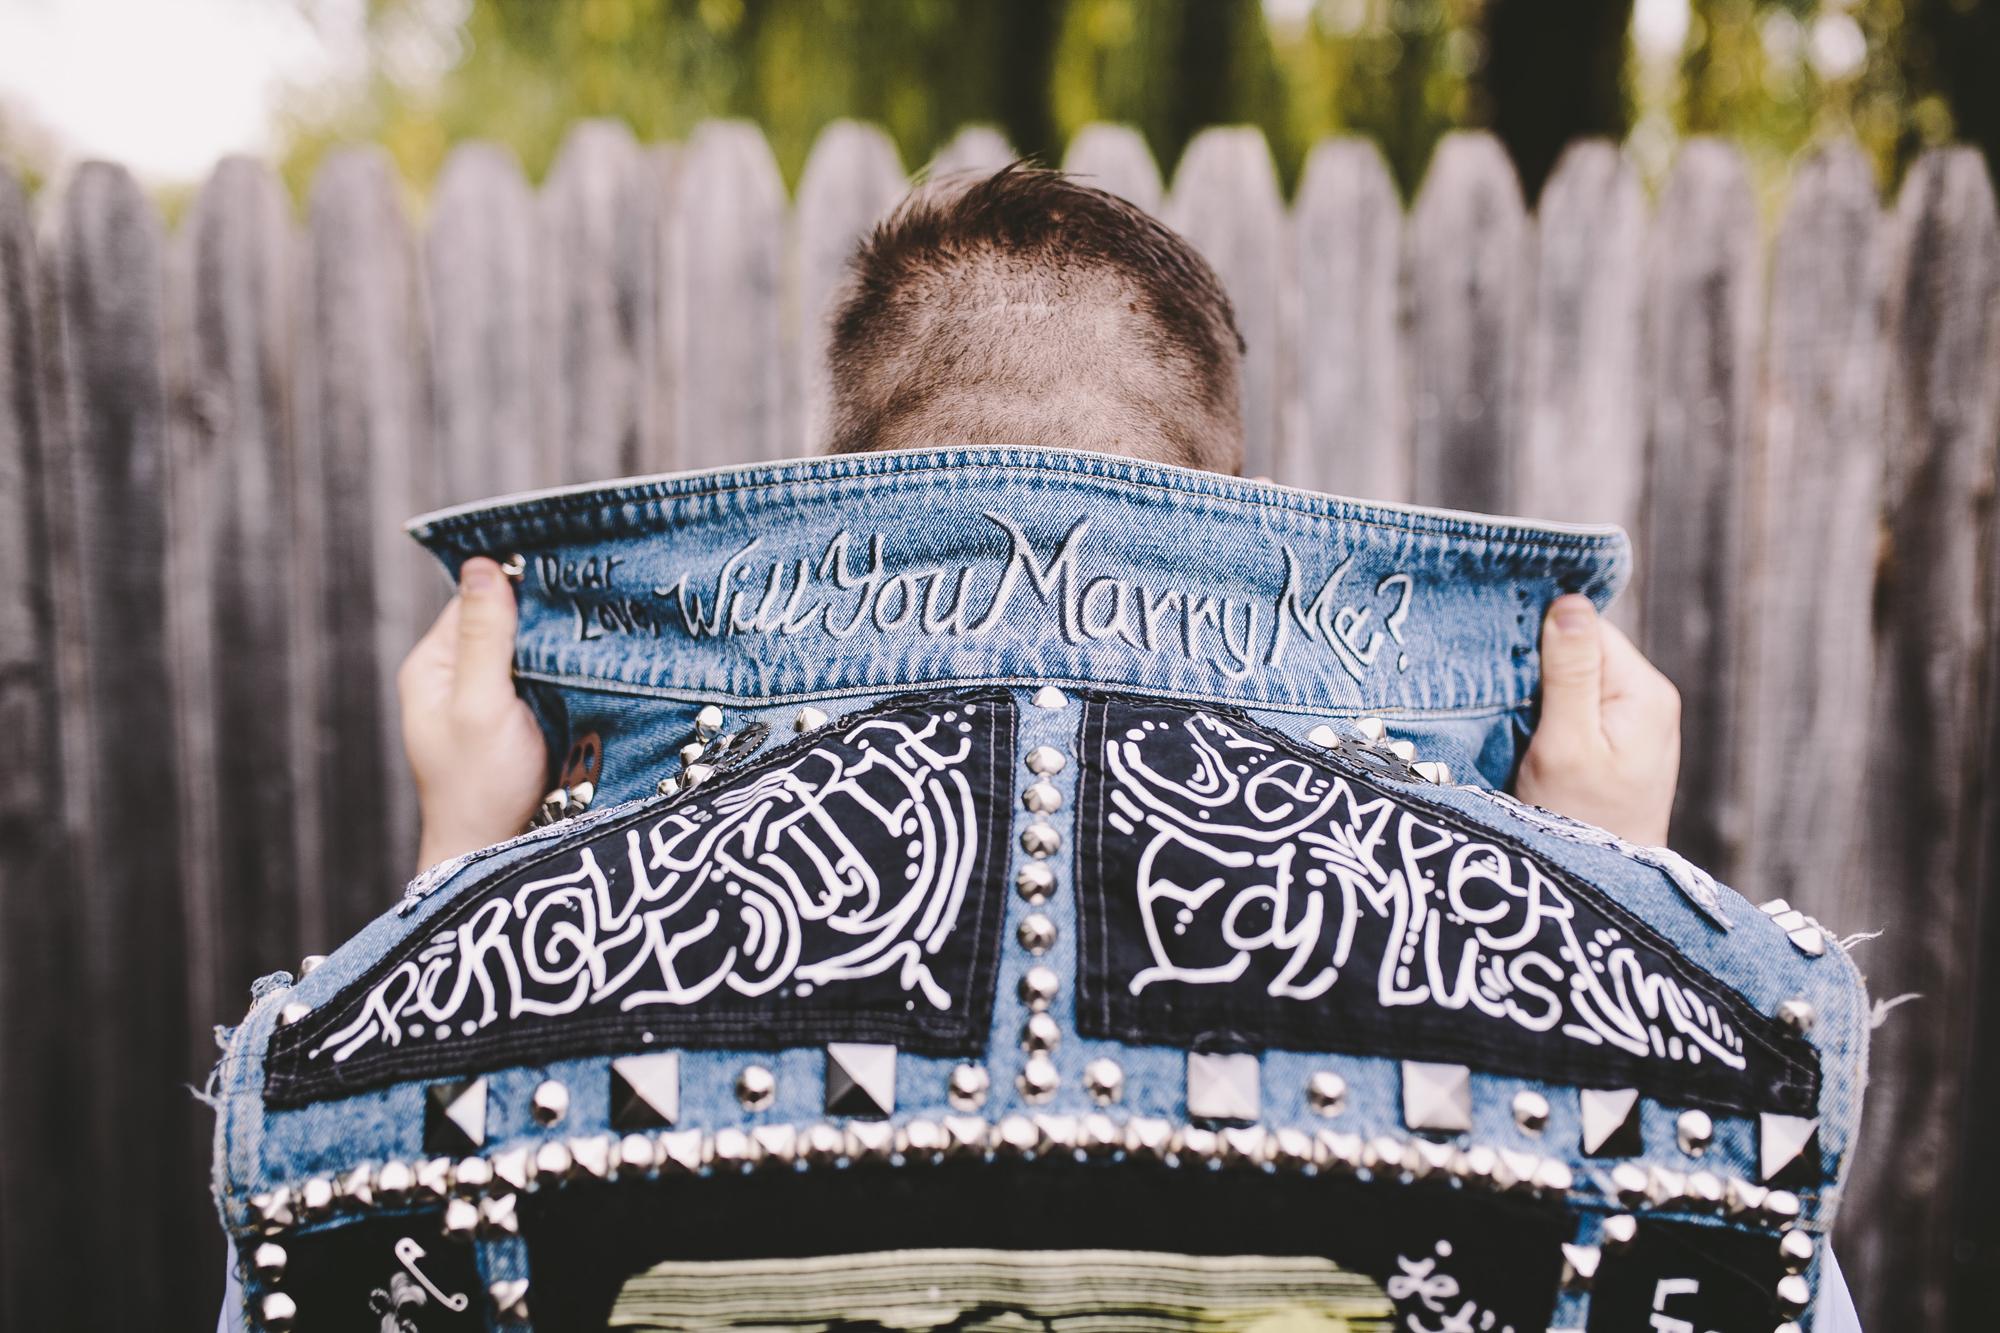 Brandon werth minnesota wedding photographer rock n roll bride punk minneapolis will you marry me custom